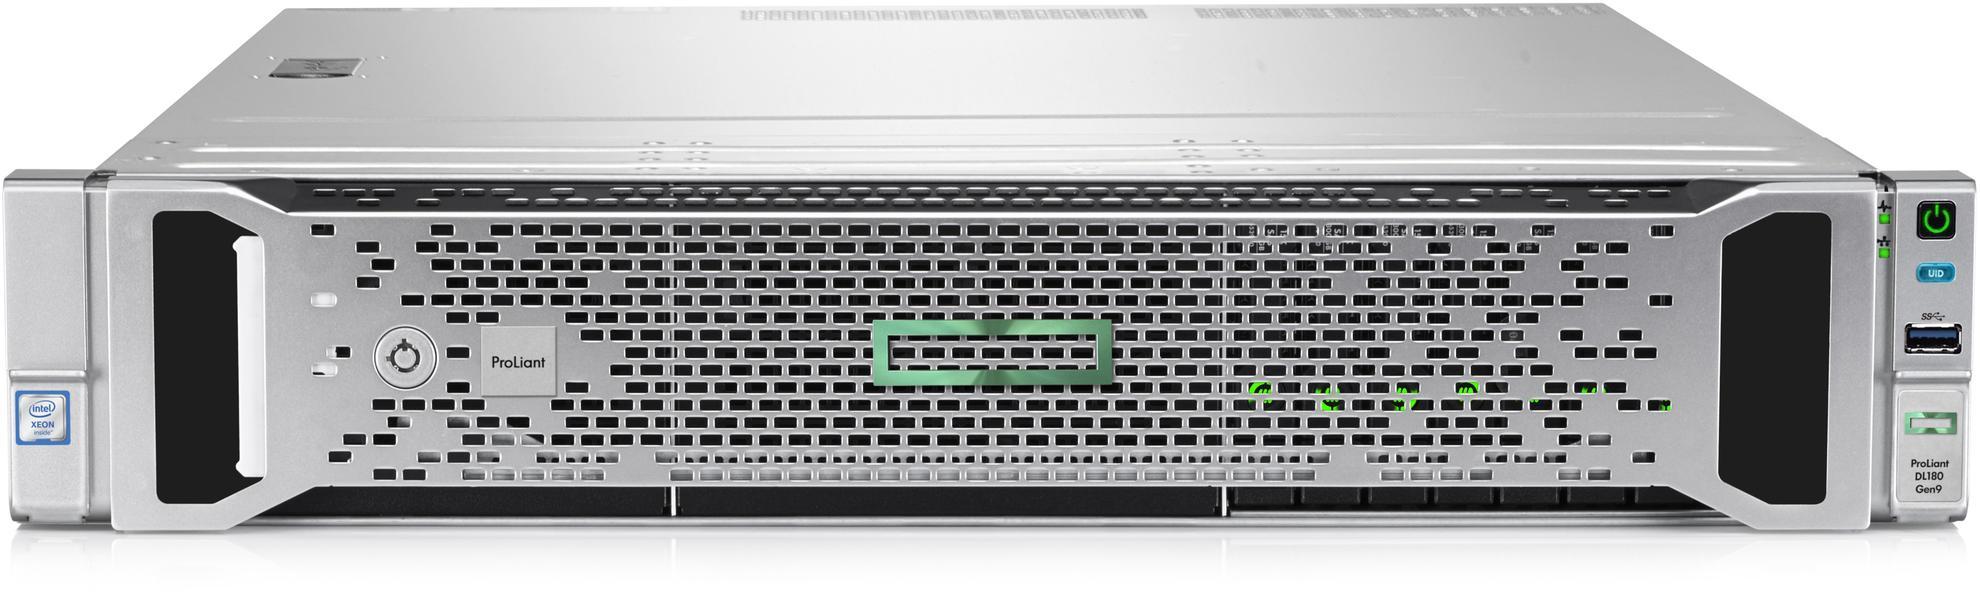 "833973-B21 ������ HP ProLiant DL180 Gen9 1xE5-2609v4 1x8Gb 8x 2.5"""" SATA H240 DP 361i 1x550W 3-1-1 (833973-B21)"